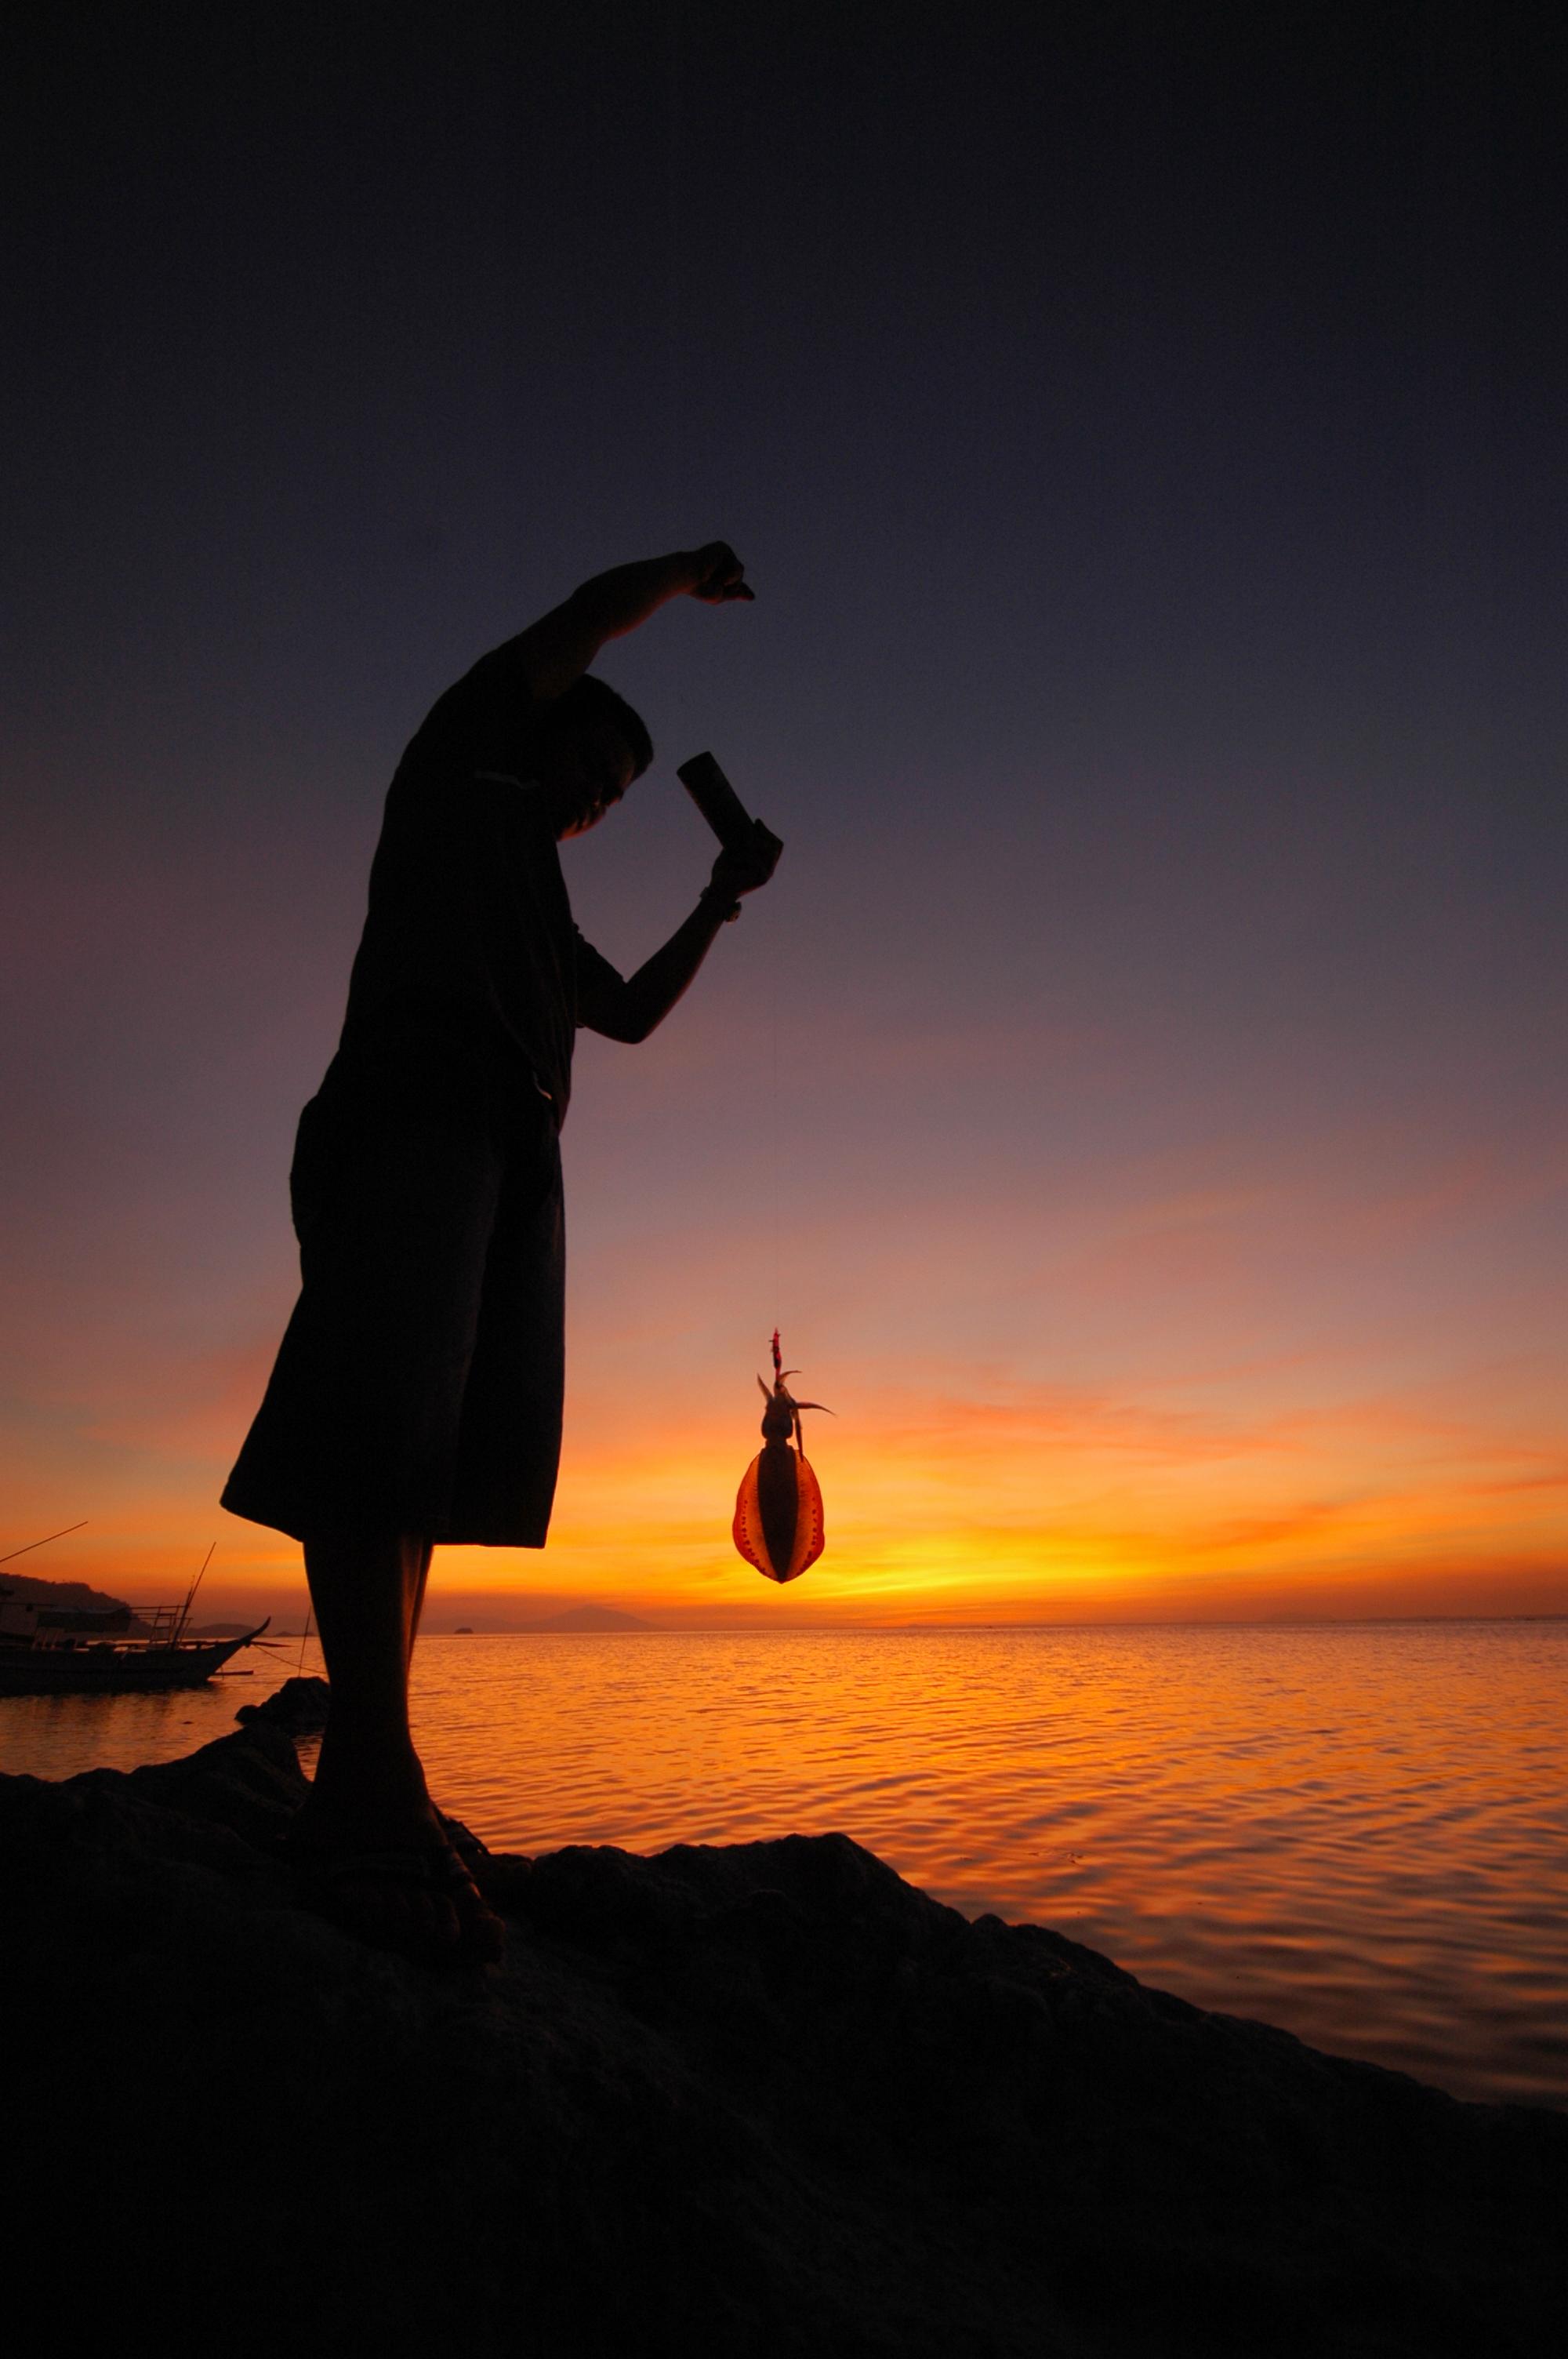 04 - small-scale fisherman CREDIT: P. PALERACIO / coral reef image bank